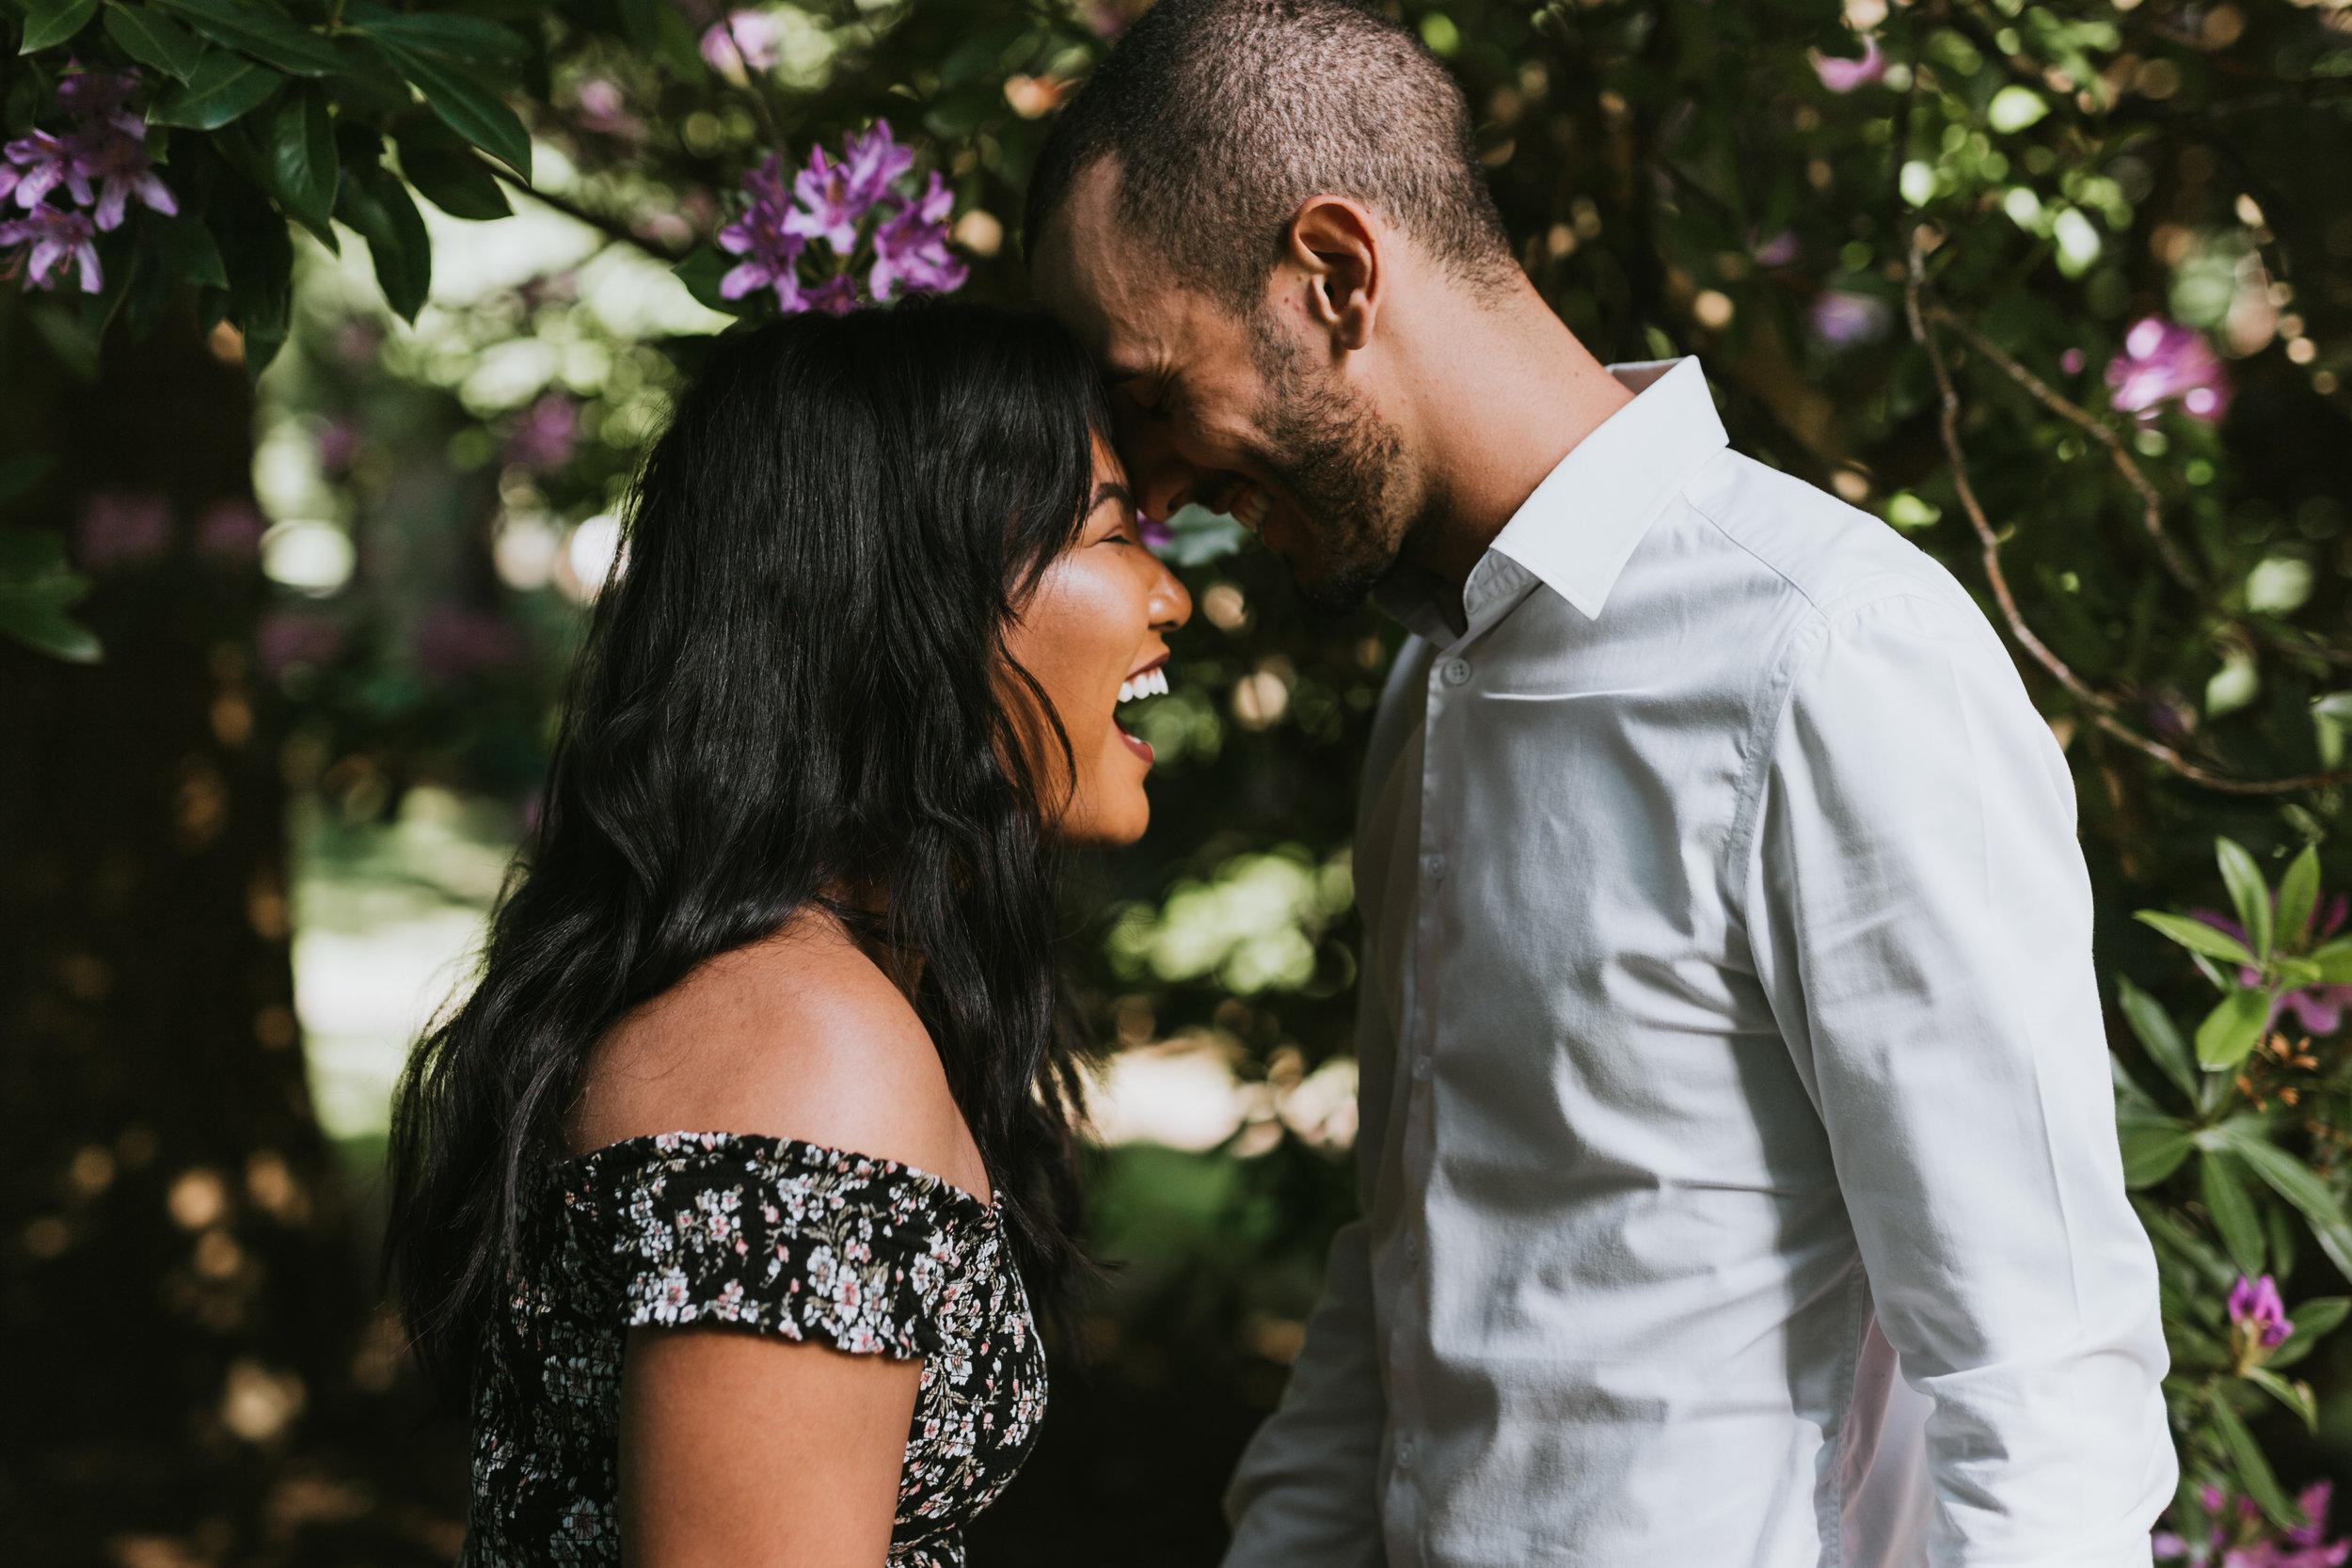 Emotional Whytecliff Park Proposal, Vancouver BC - Czarina & Renan -